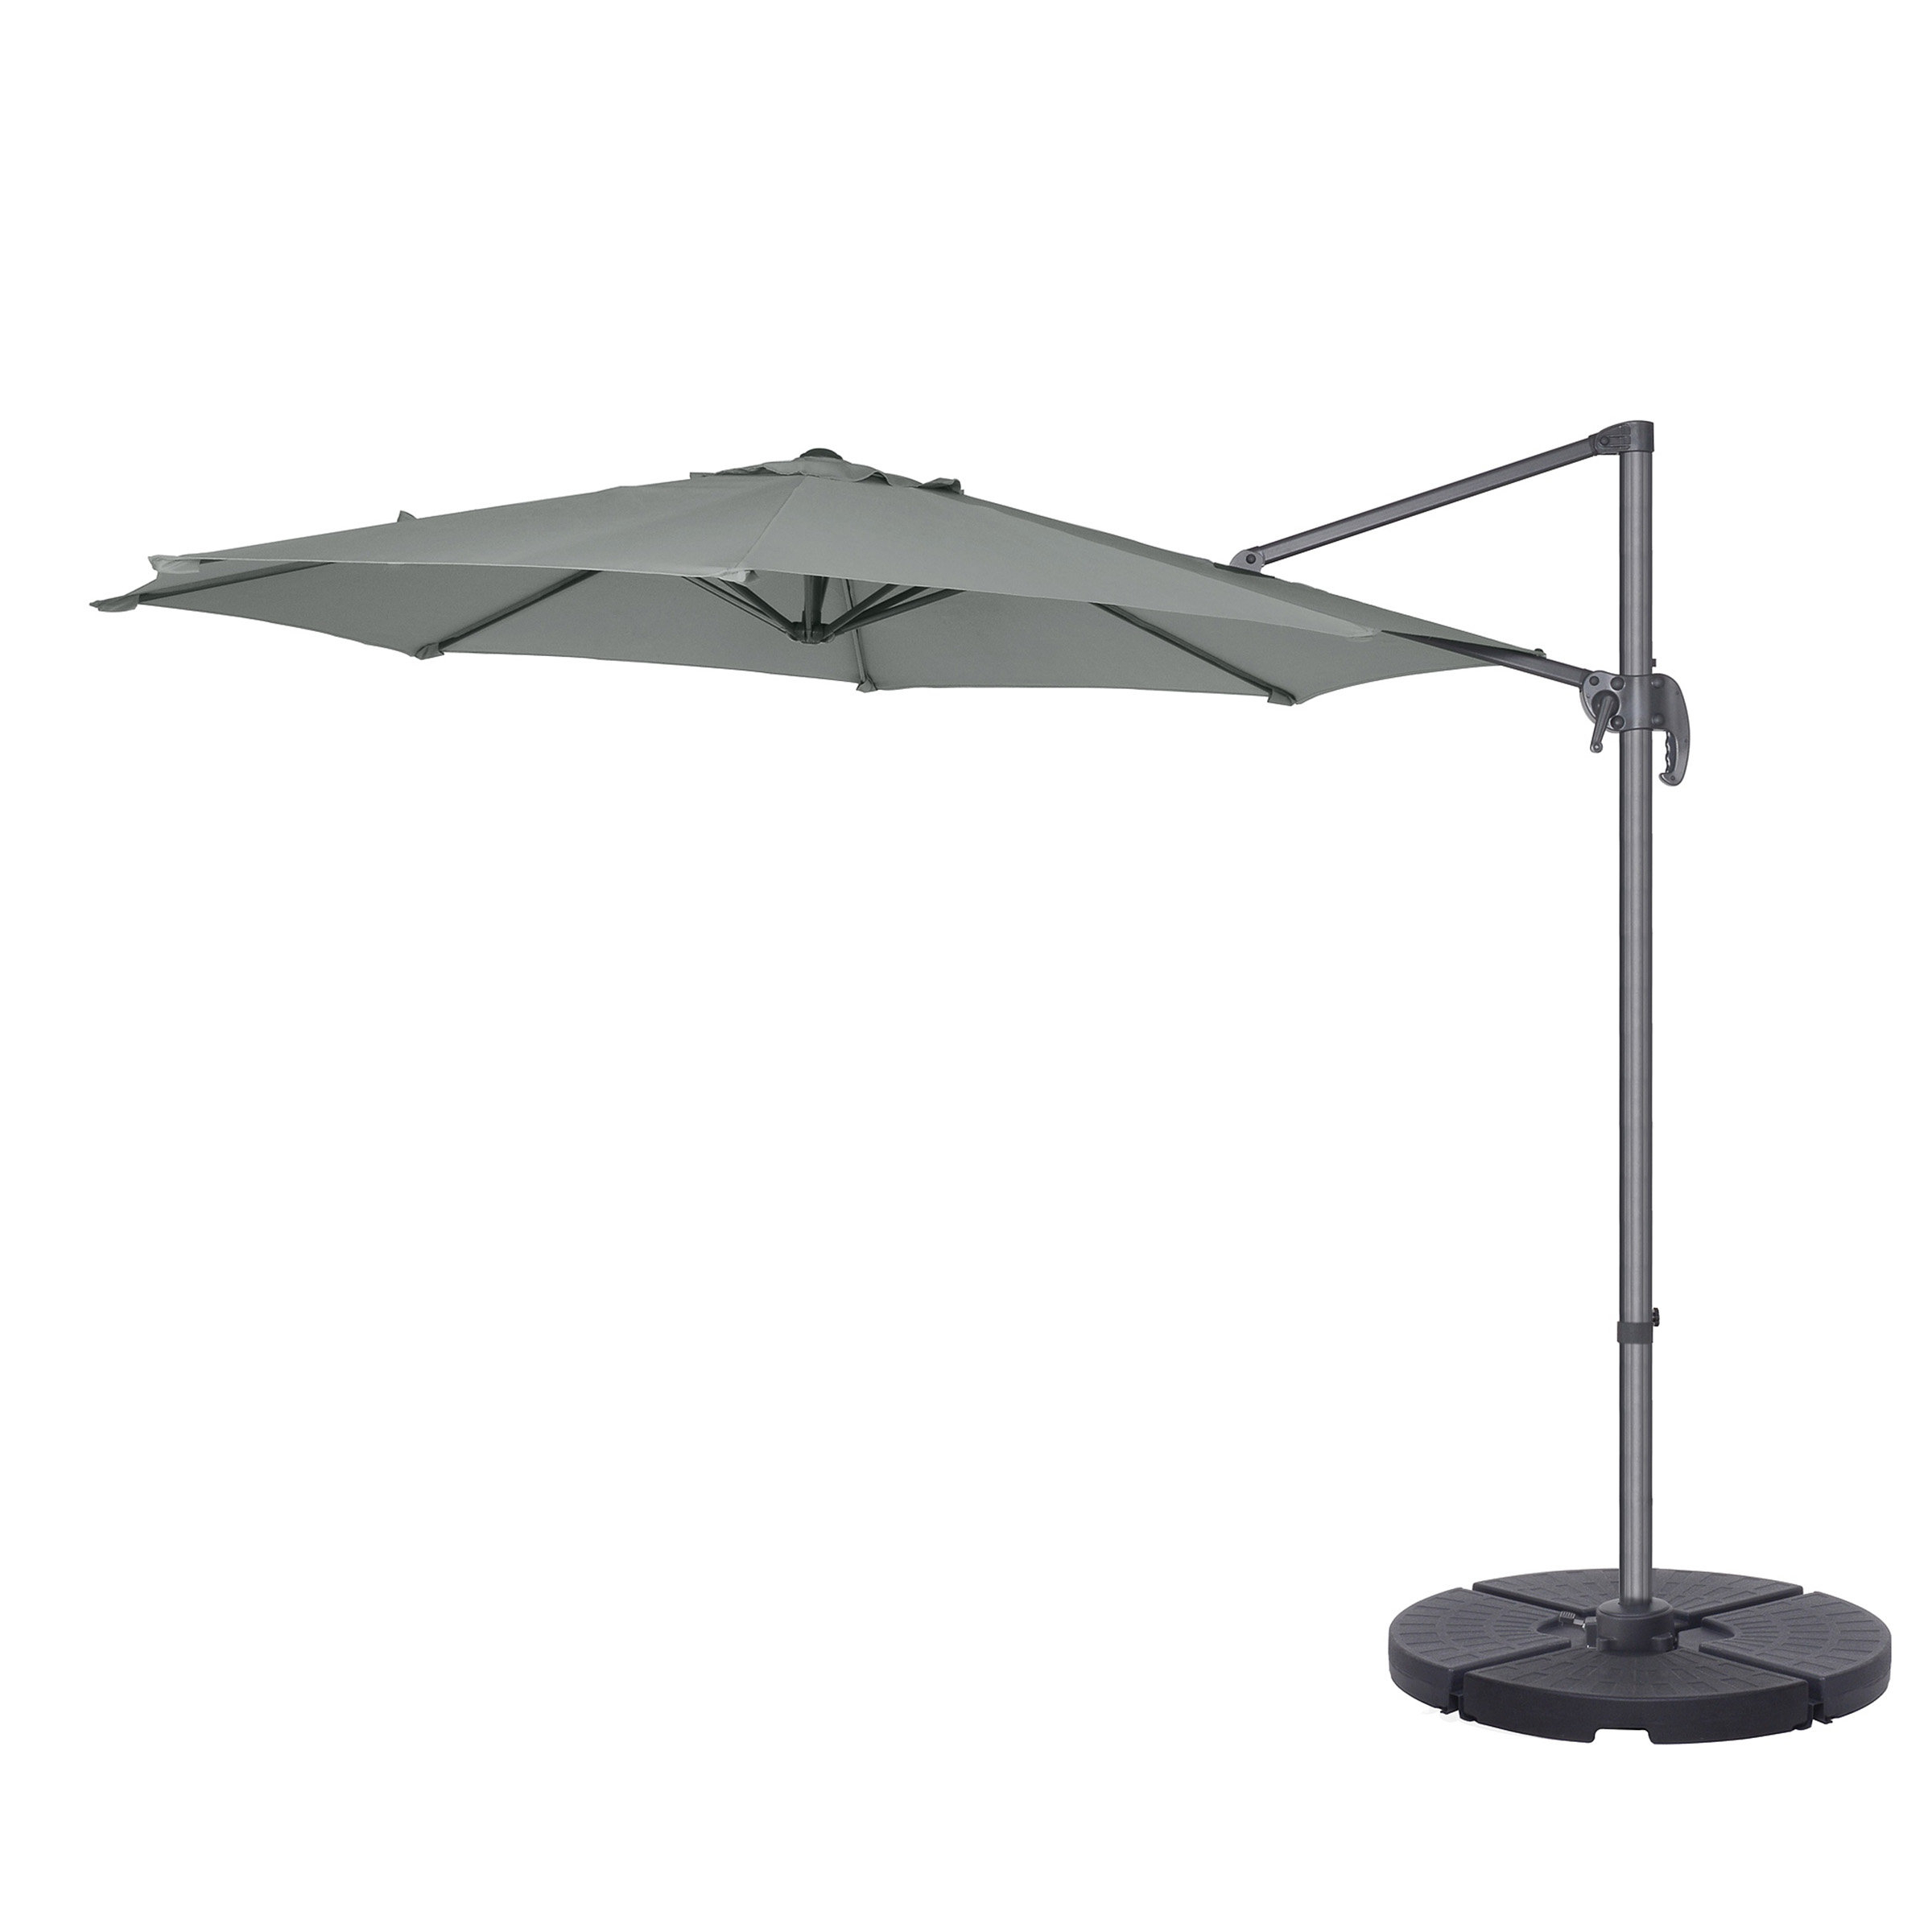 Most Recent Ryant Cantilever Umbrellas Regarding Cockermouth Rotating 10' Cantilever Umbrella (View 6 of 20)